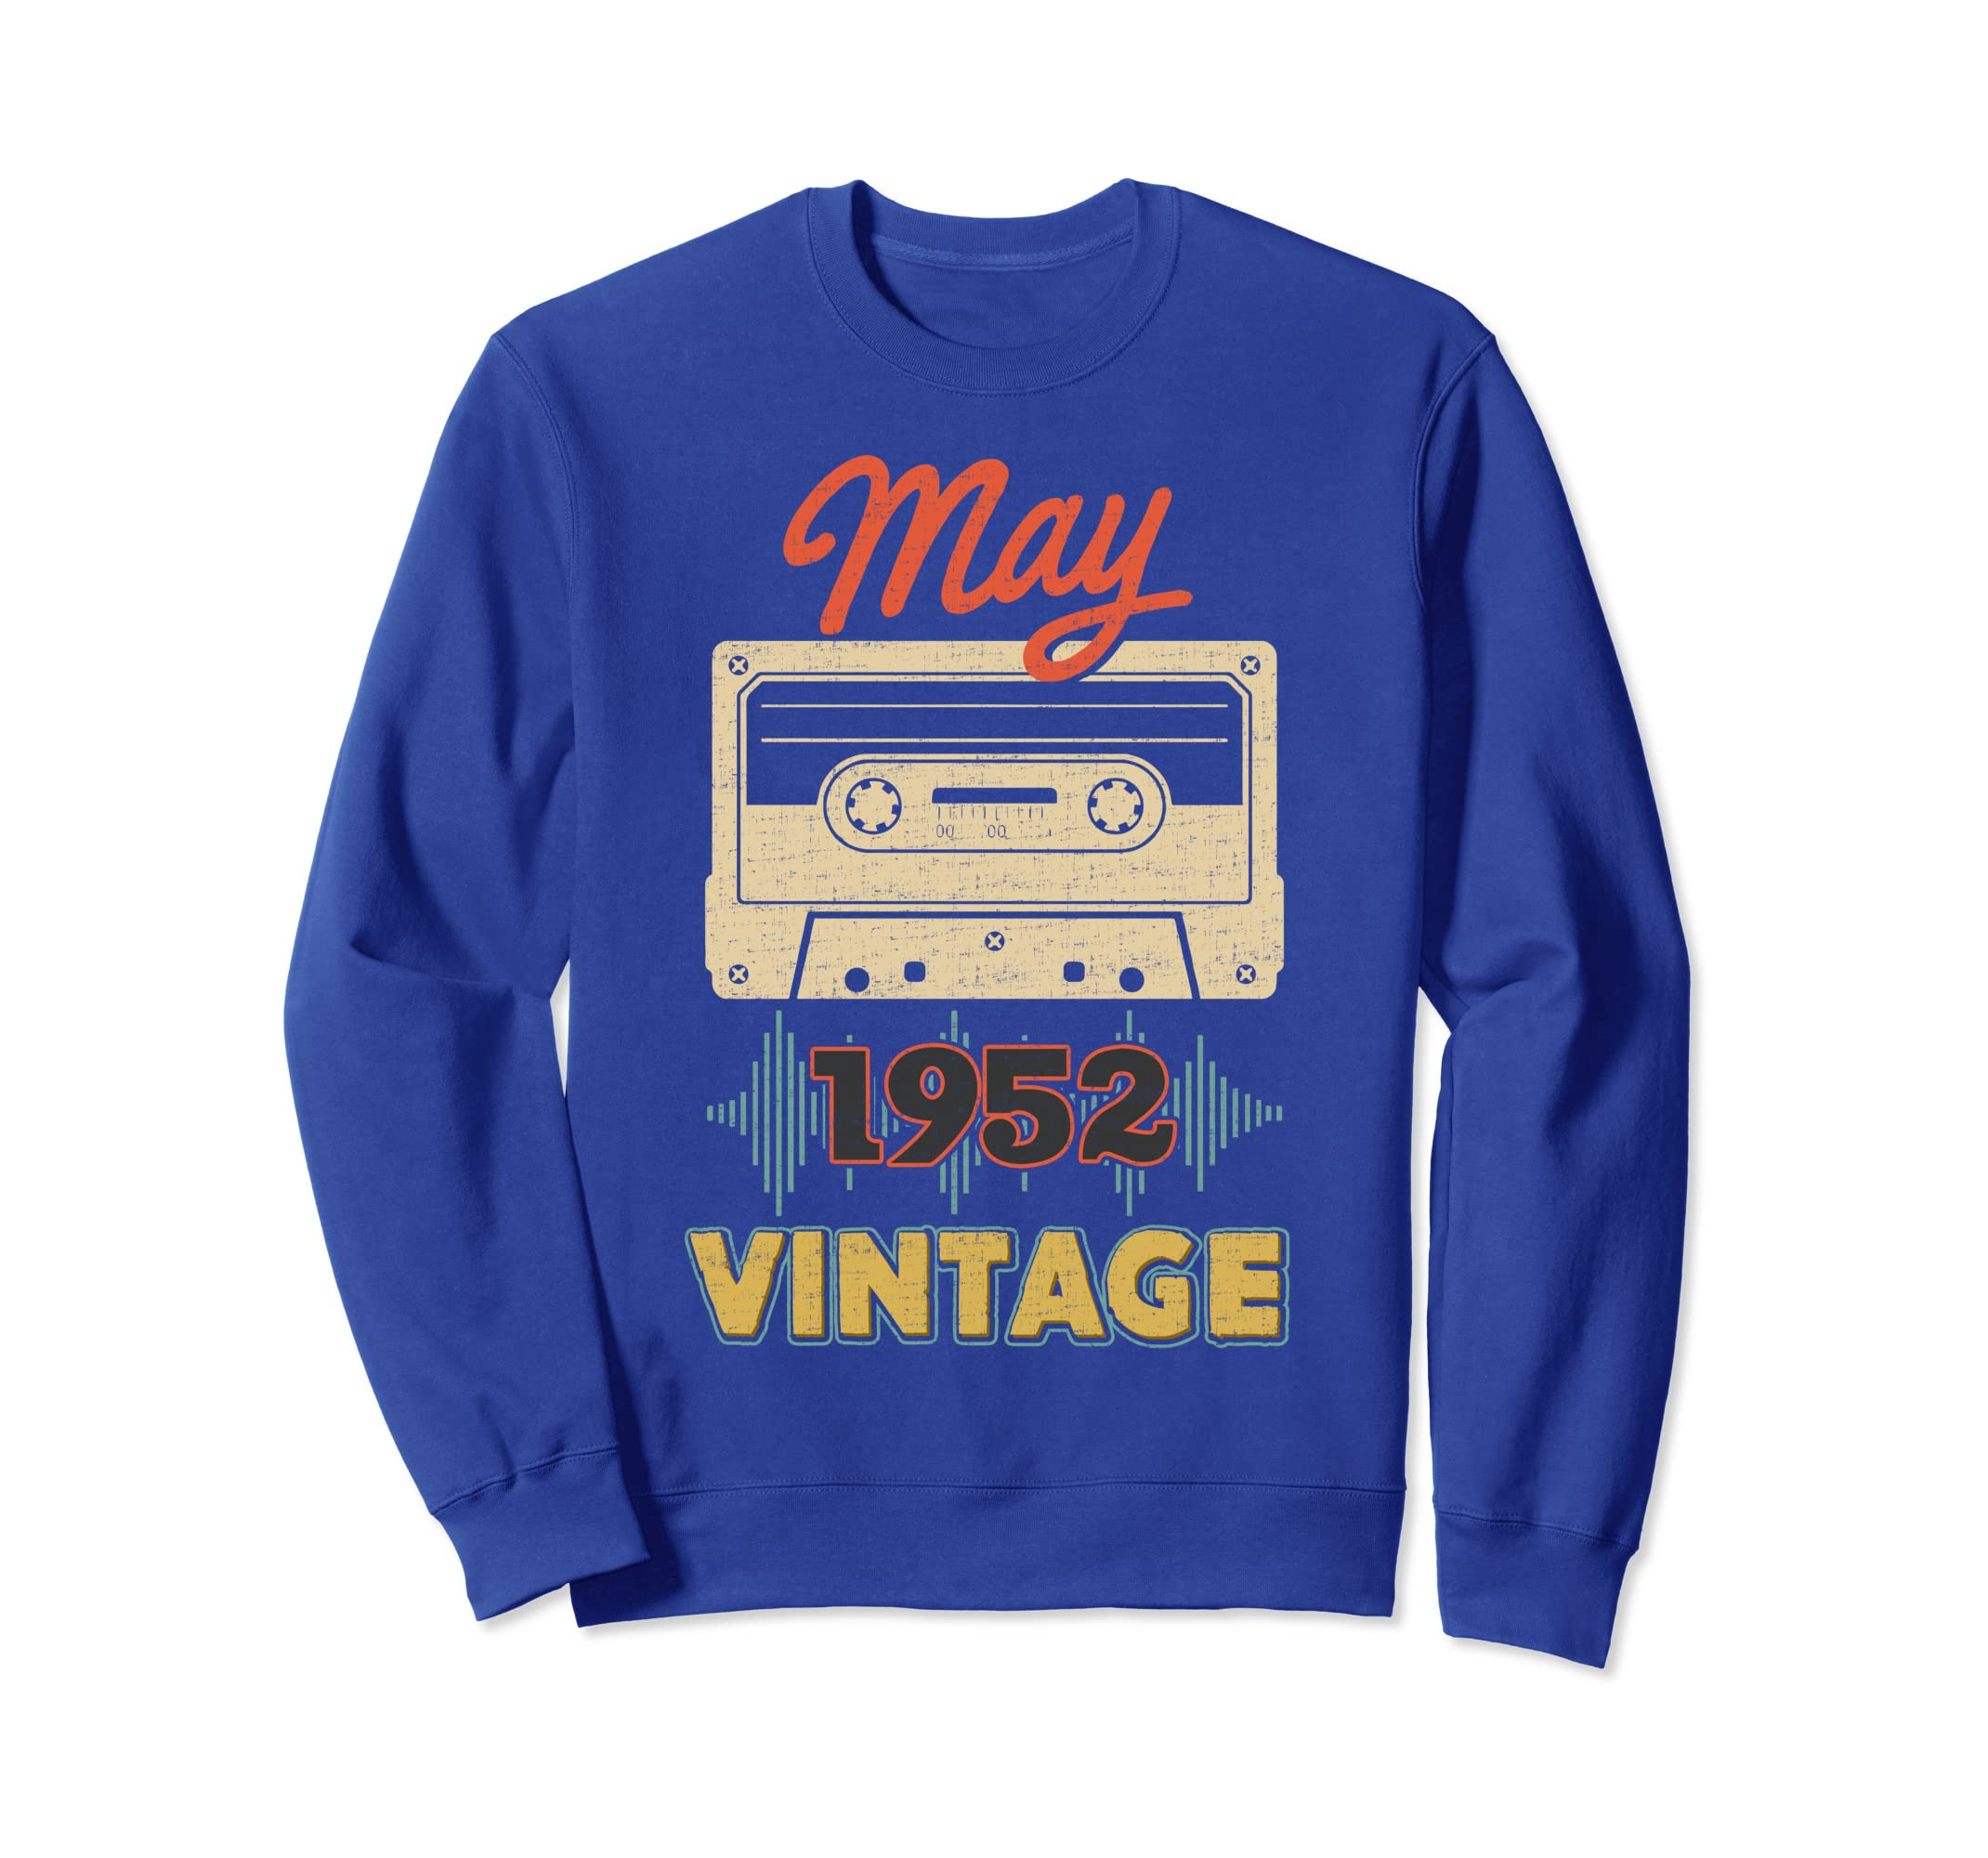 Vintage-May 1952 Classic Retro-Mixtape Sweatshirt-azvn